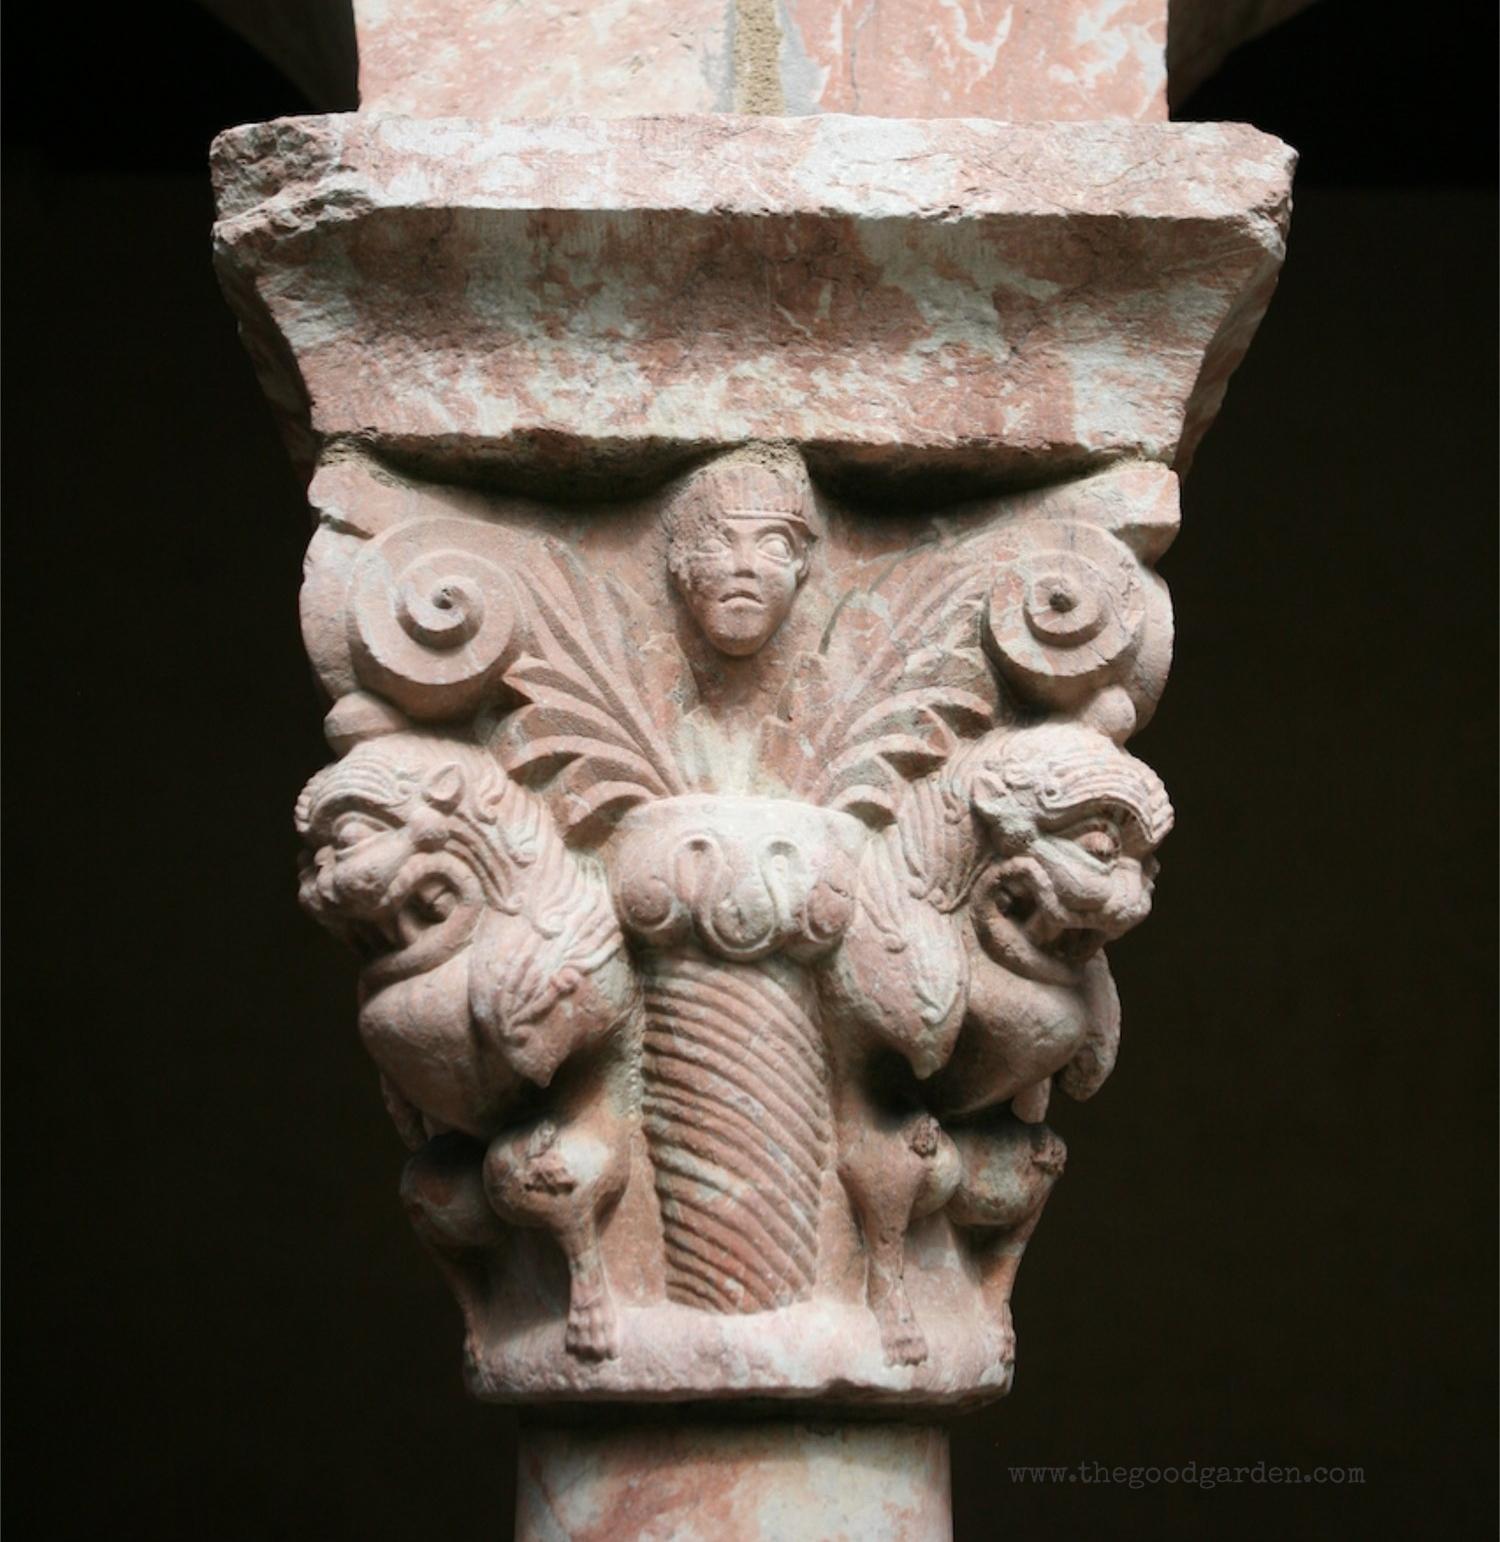 thegoodgarden|thecloistersmuseum|nyc|2877.jpg